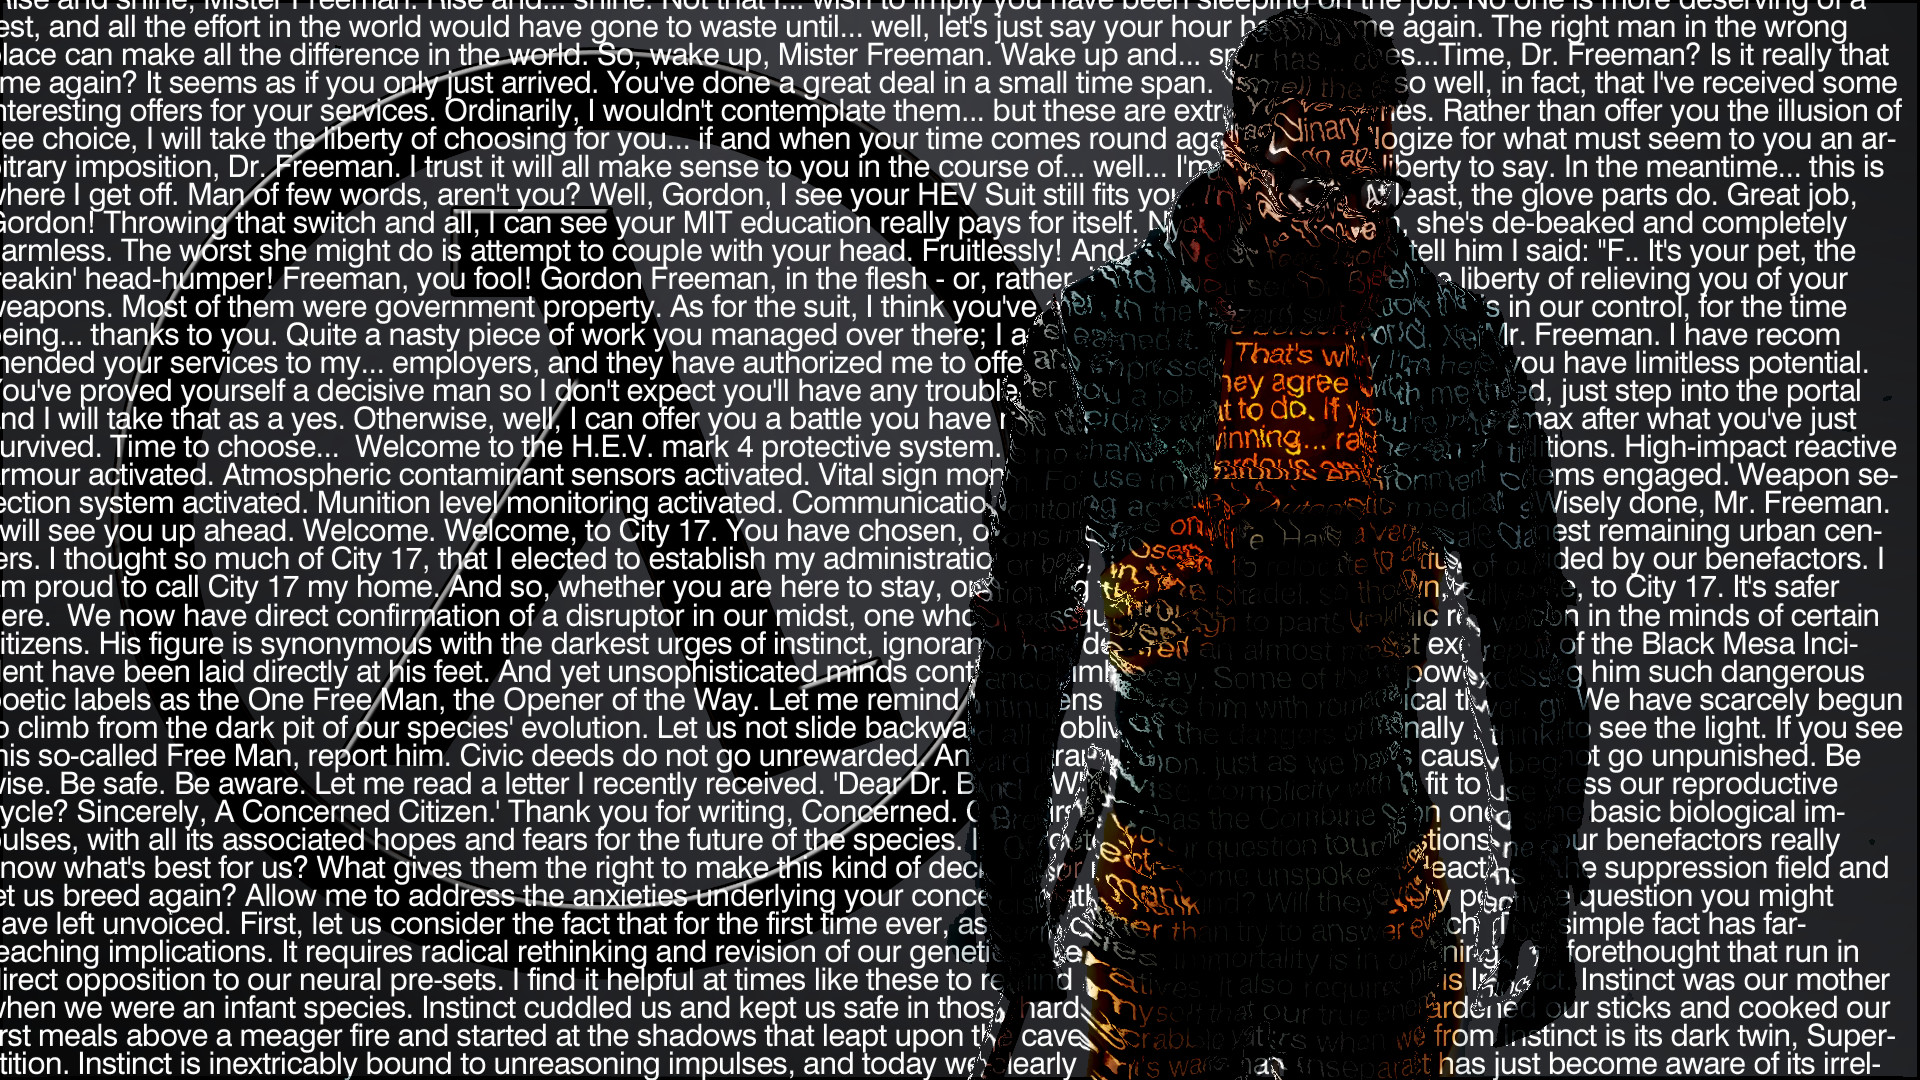 Half Life, Valve Corporation, Gordon Freeman, Video Games, Half Life 2